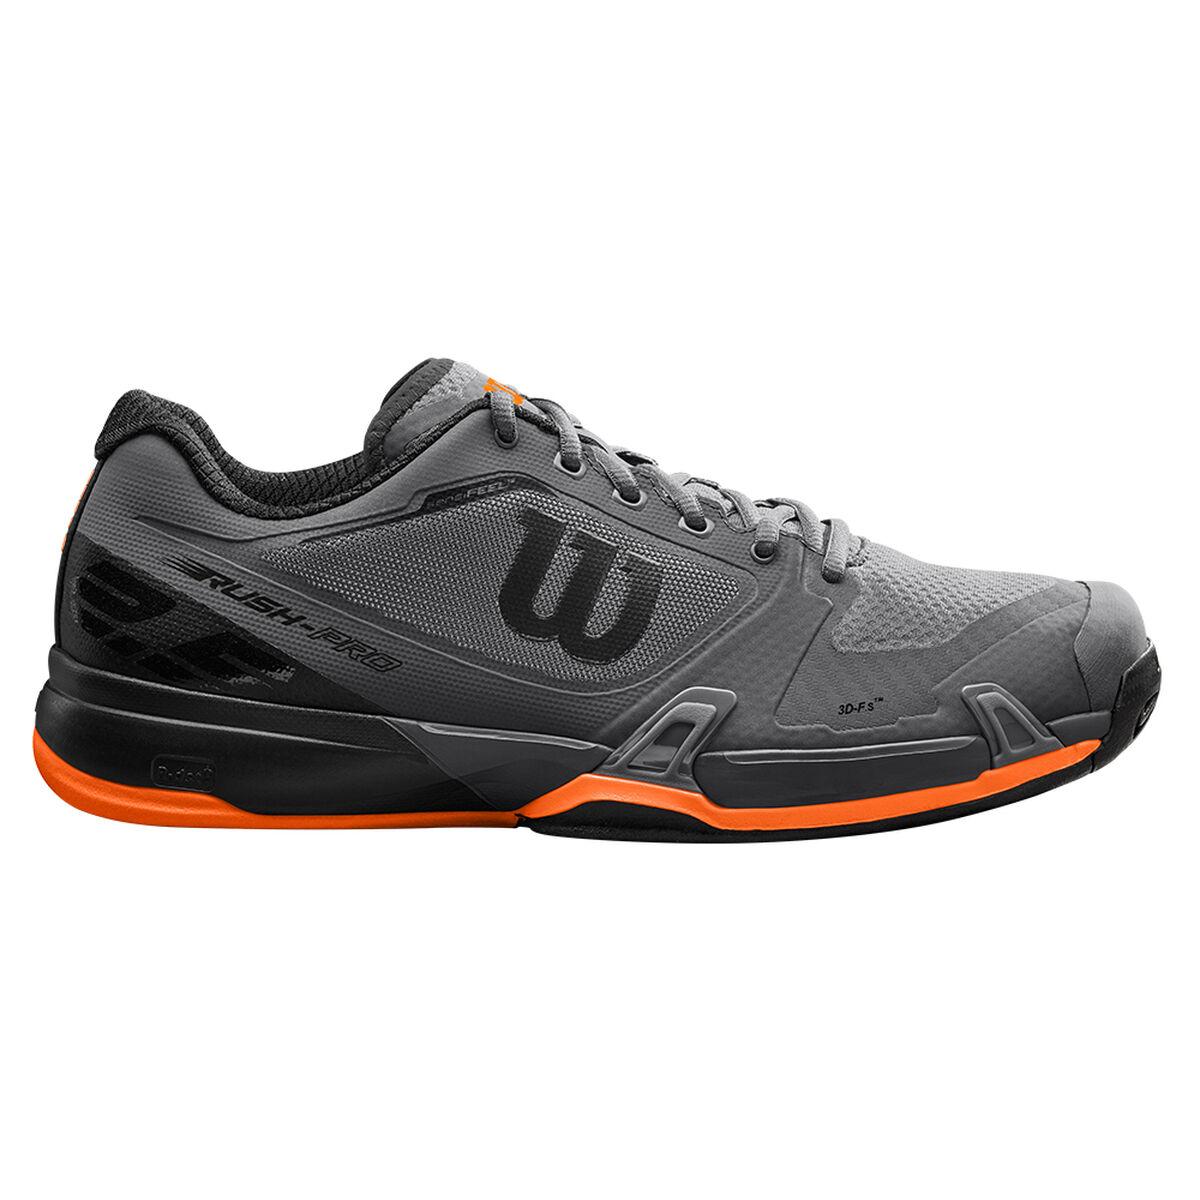 538a0e8a9d1d Wilson Rush Pro 2.5 Men s Tennis Shoe - Grey